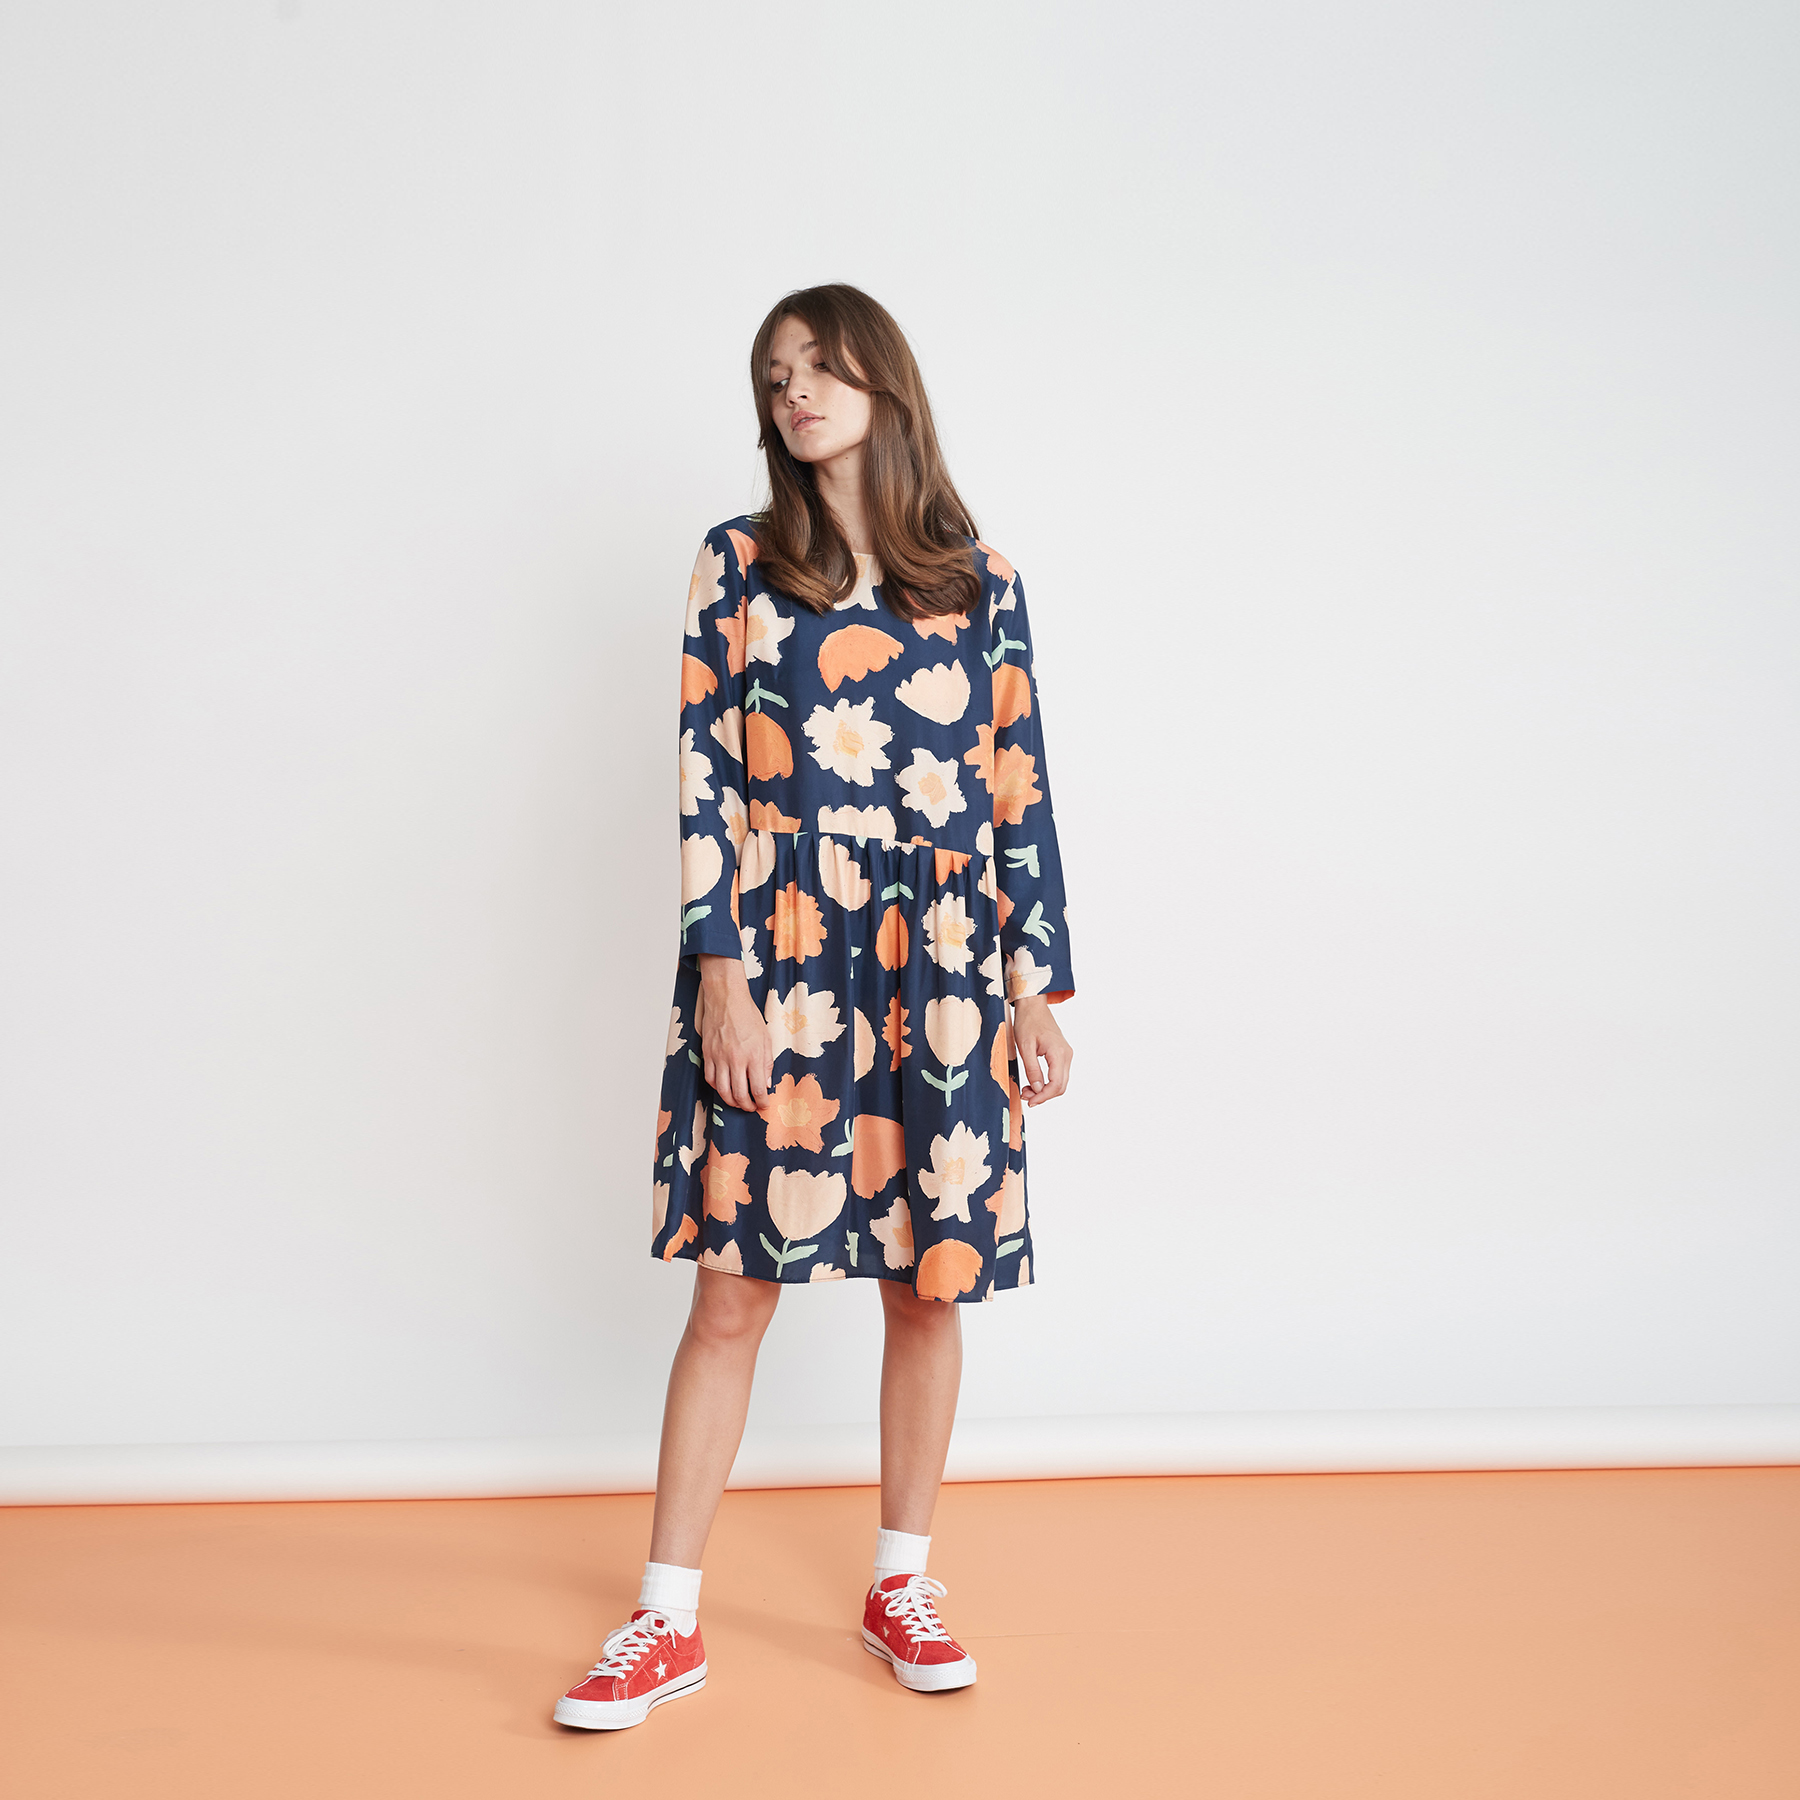 LB squares_0005_13. The Letter dress.jpg